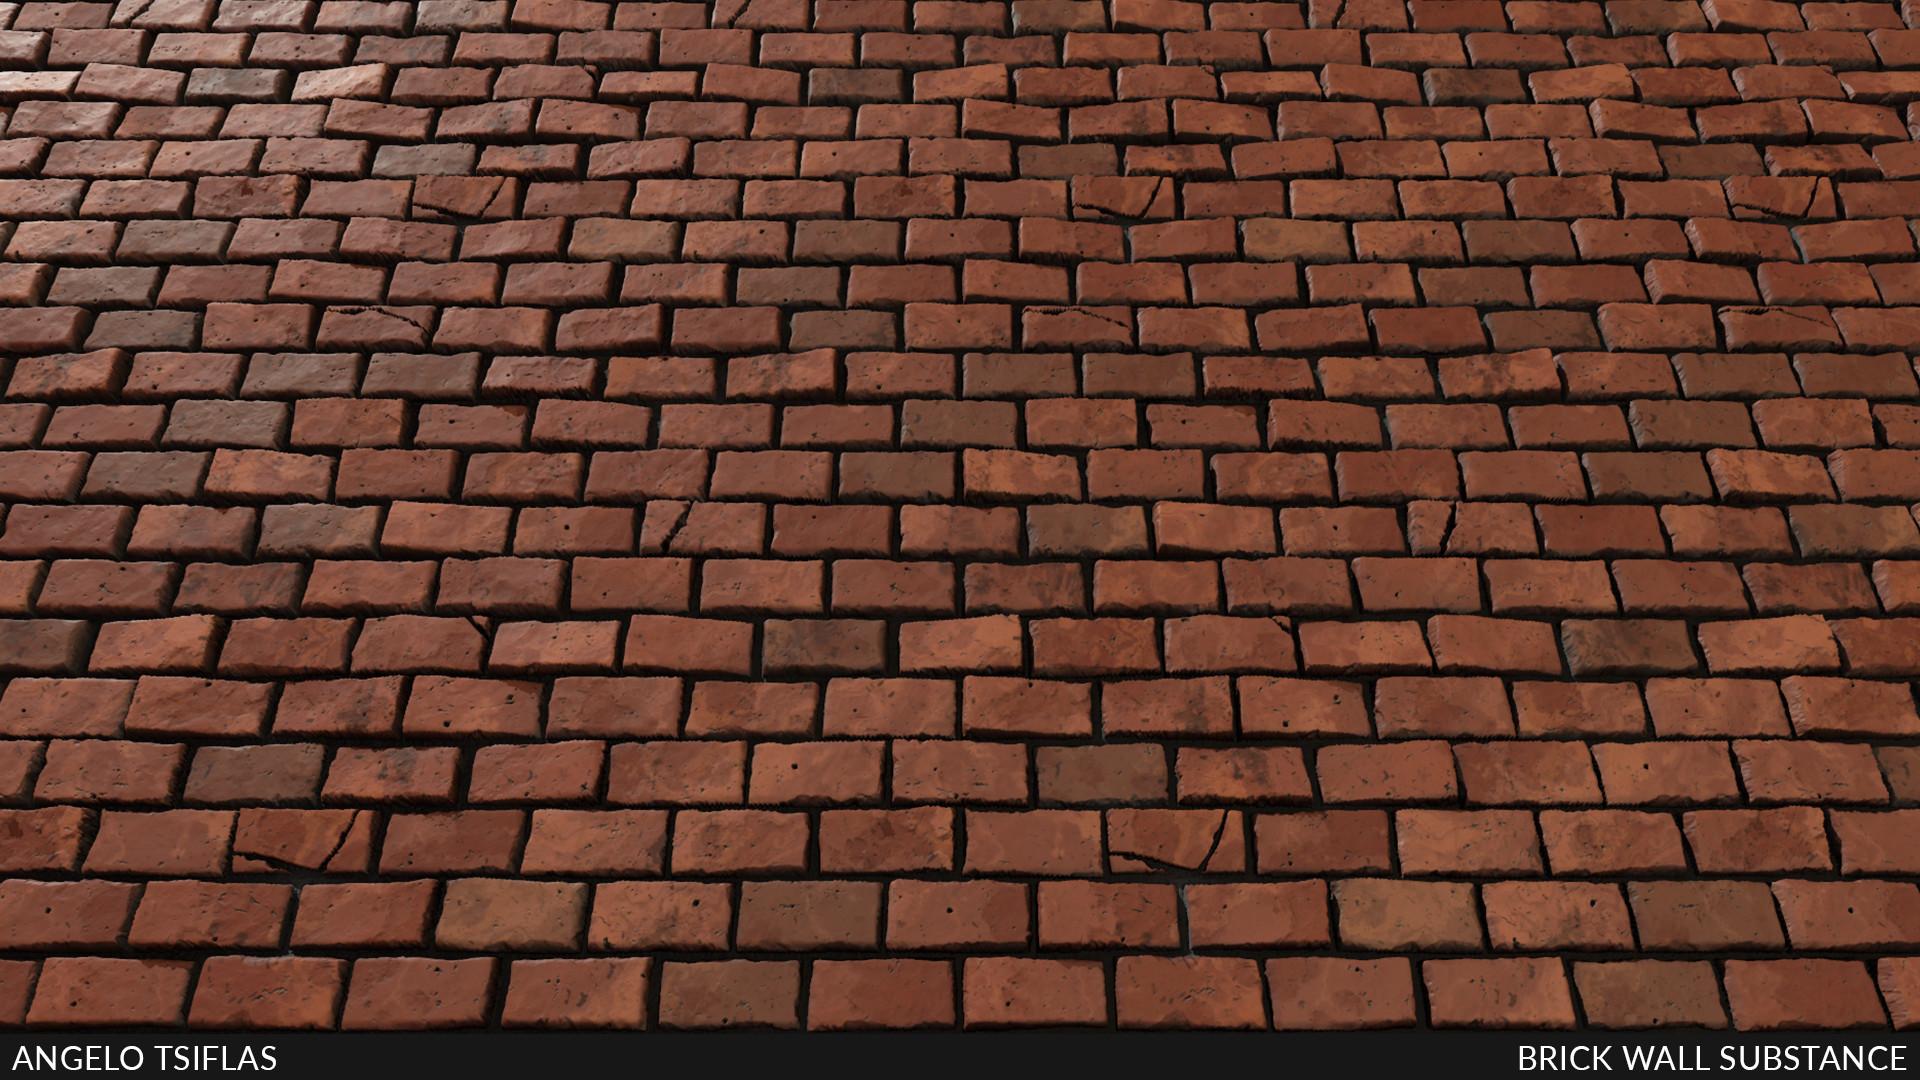 Angelo tsiflas brickwall full background